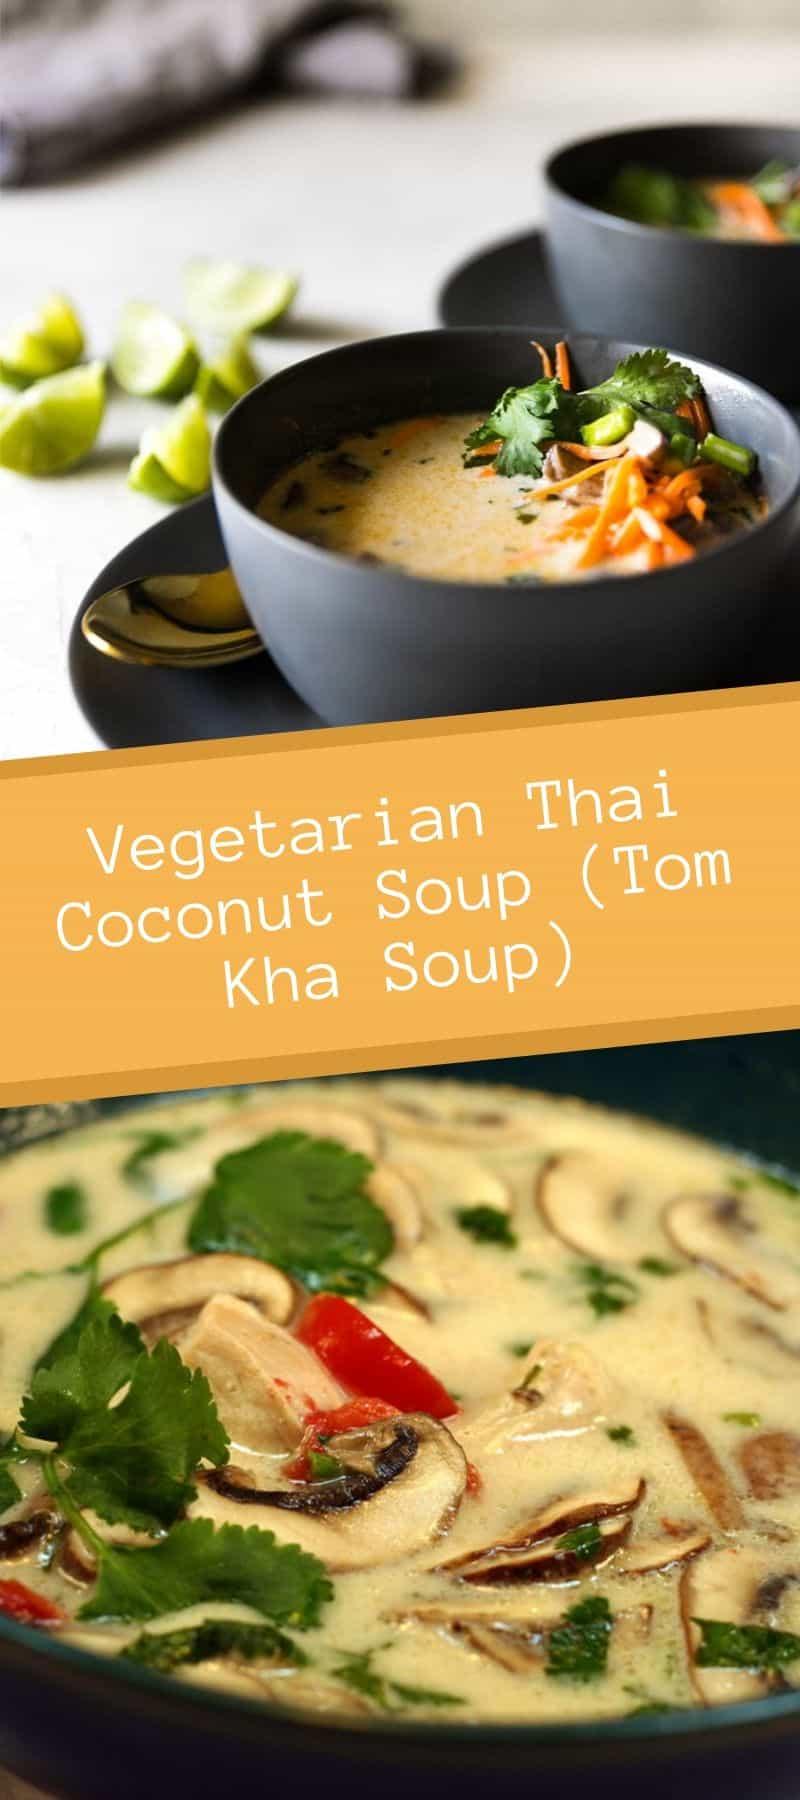 Vegetarian Thai Coconut Soup (Tom Kha Soup) 3